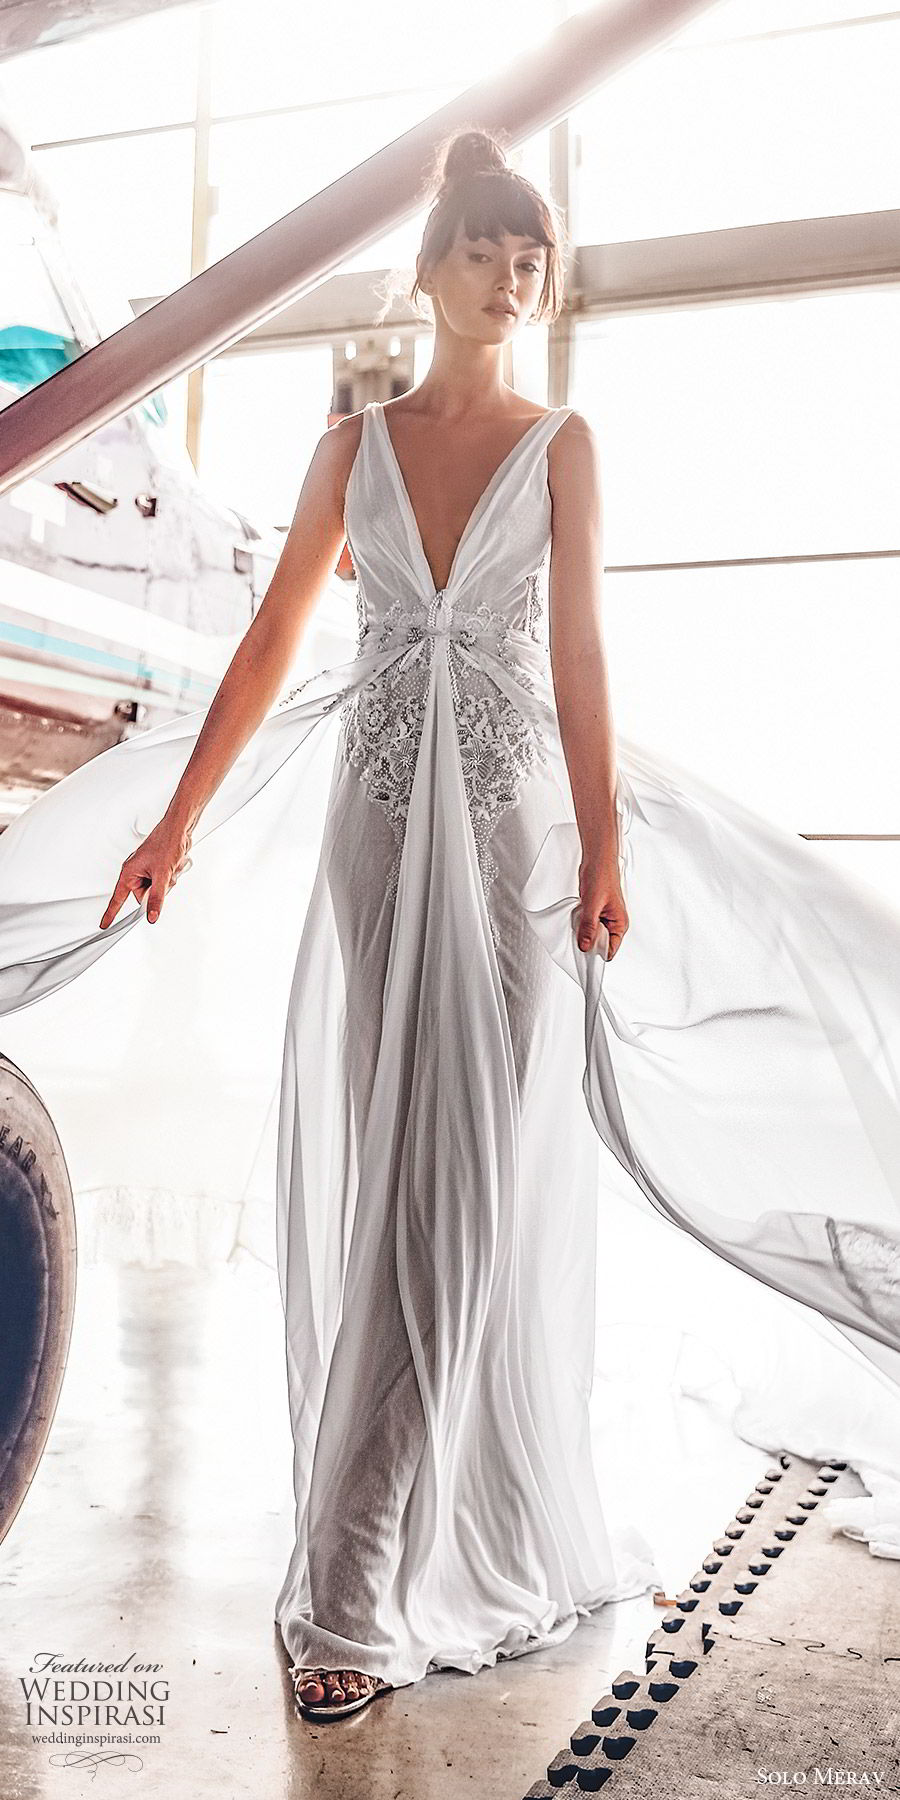 solo merav 2019 bridal sleeveless deep v neckline draped bodice embellished waist column a line wedding dress (3) mv sweep train glam romantic